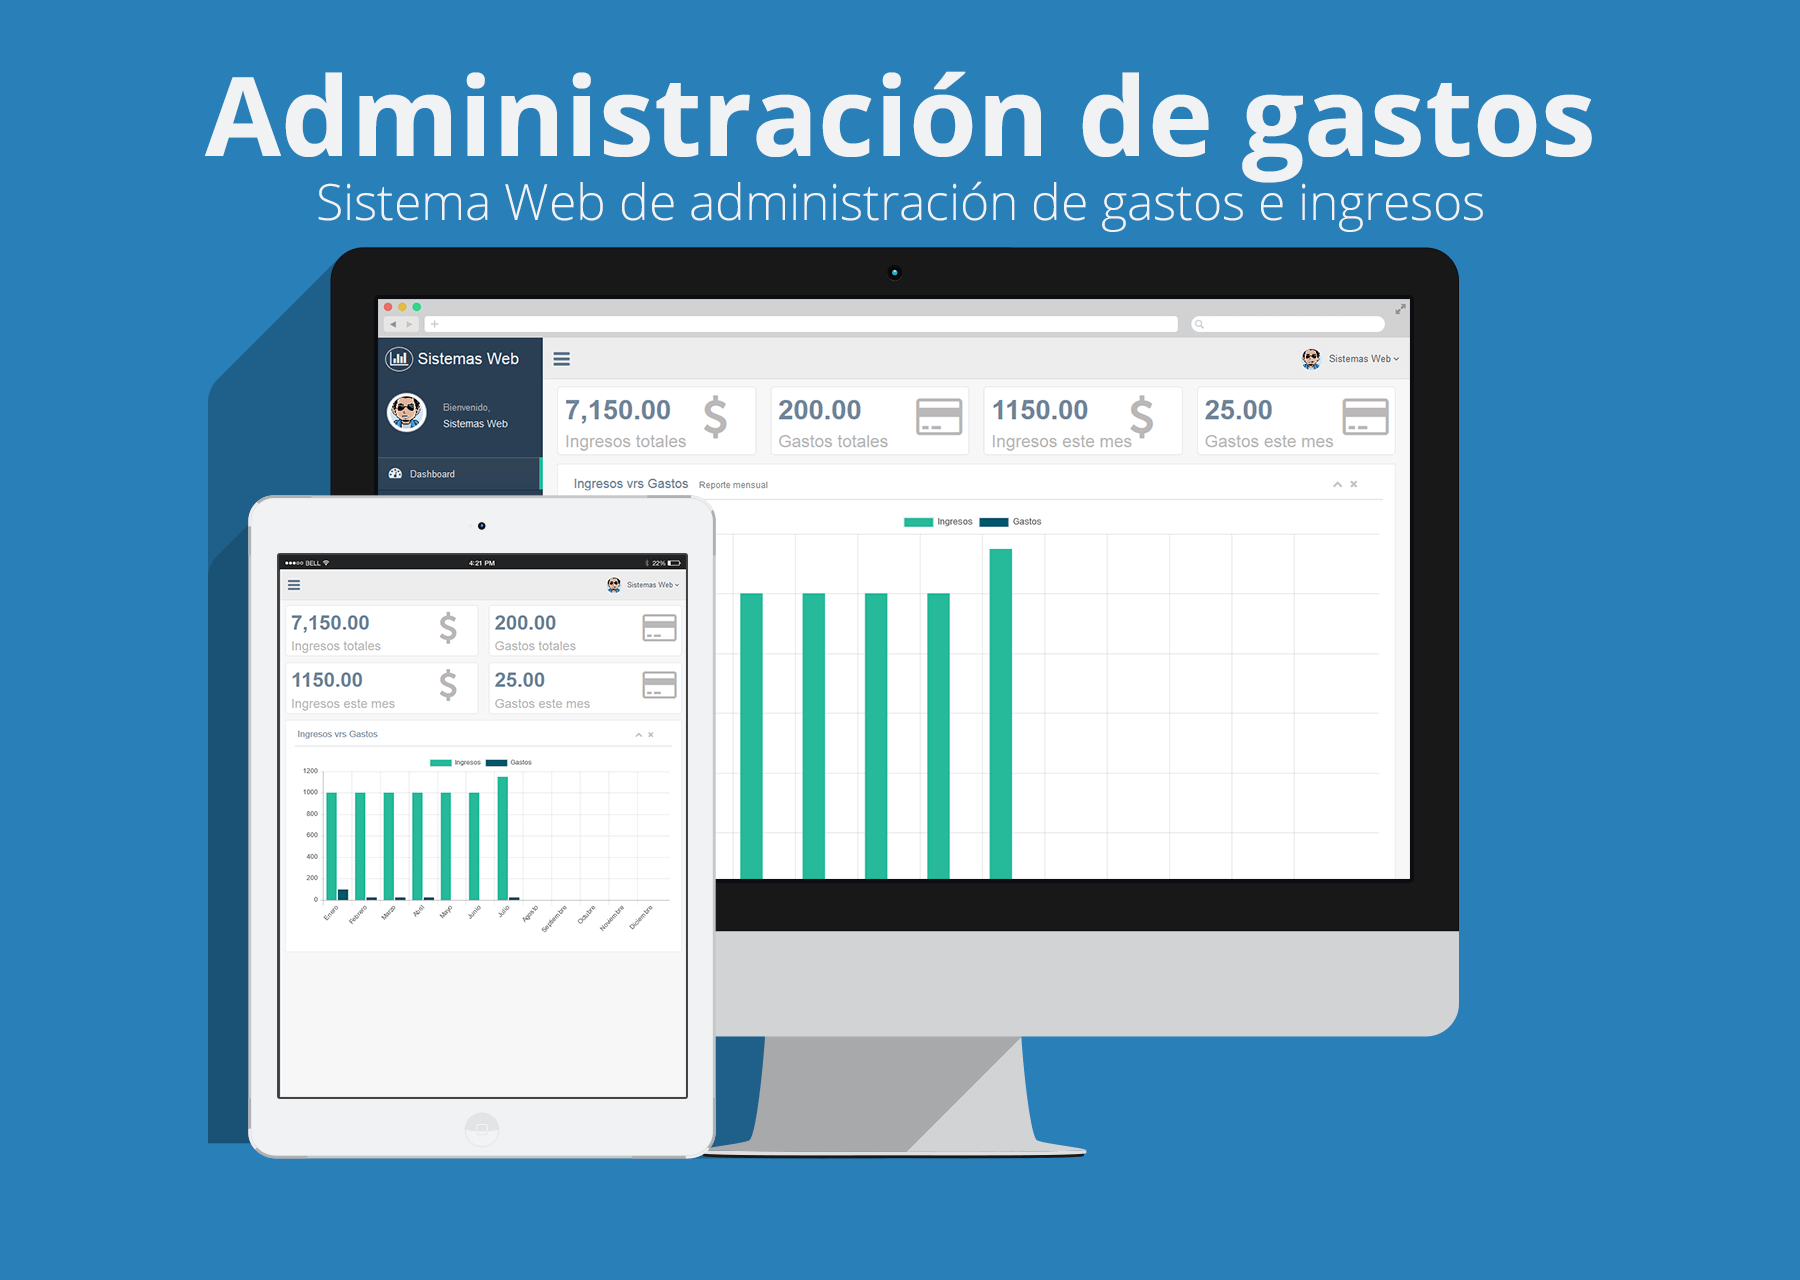 Sistema web de administración de gastos e ingresos